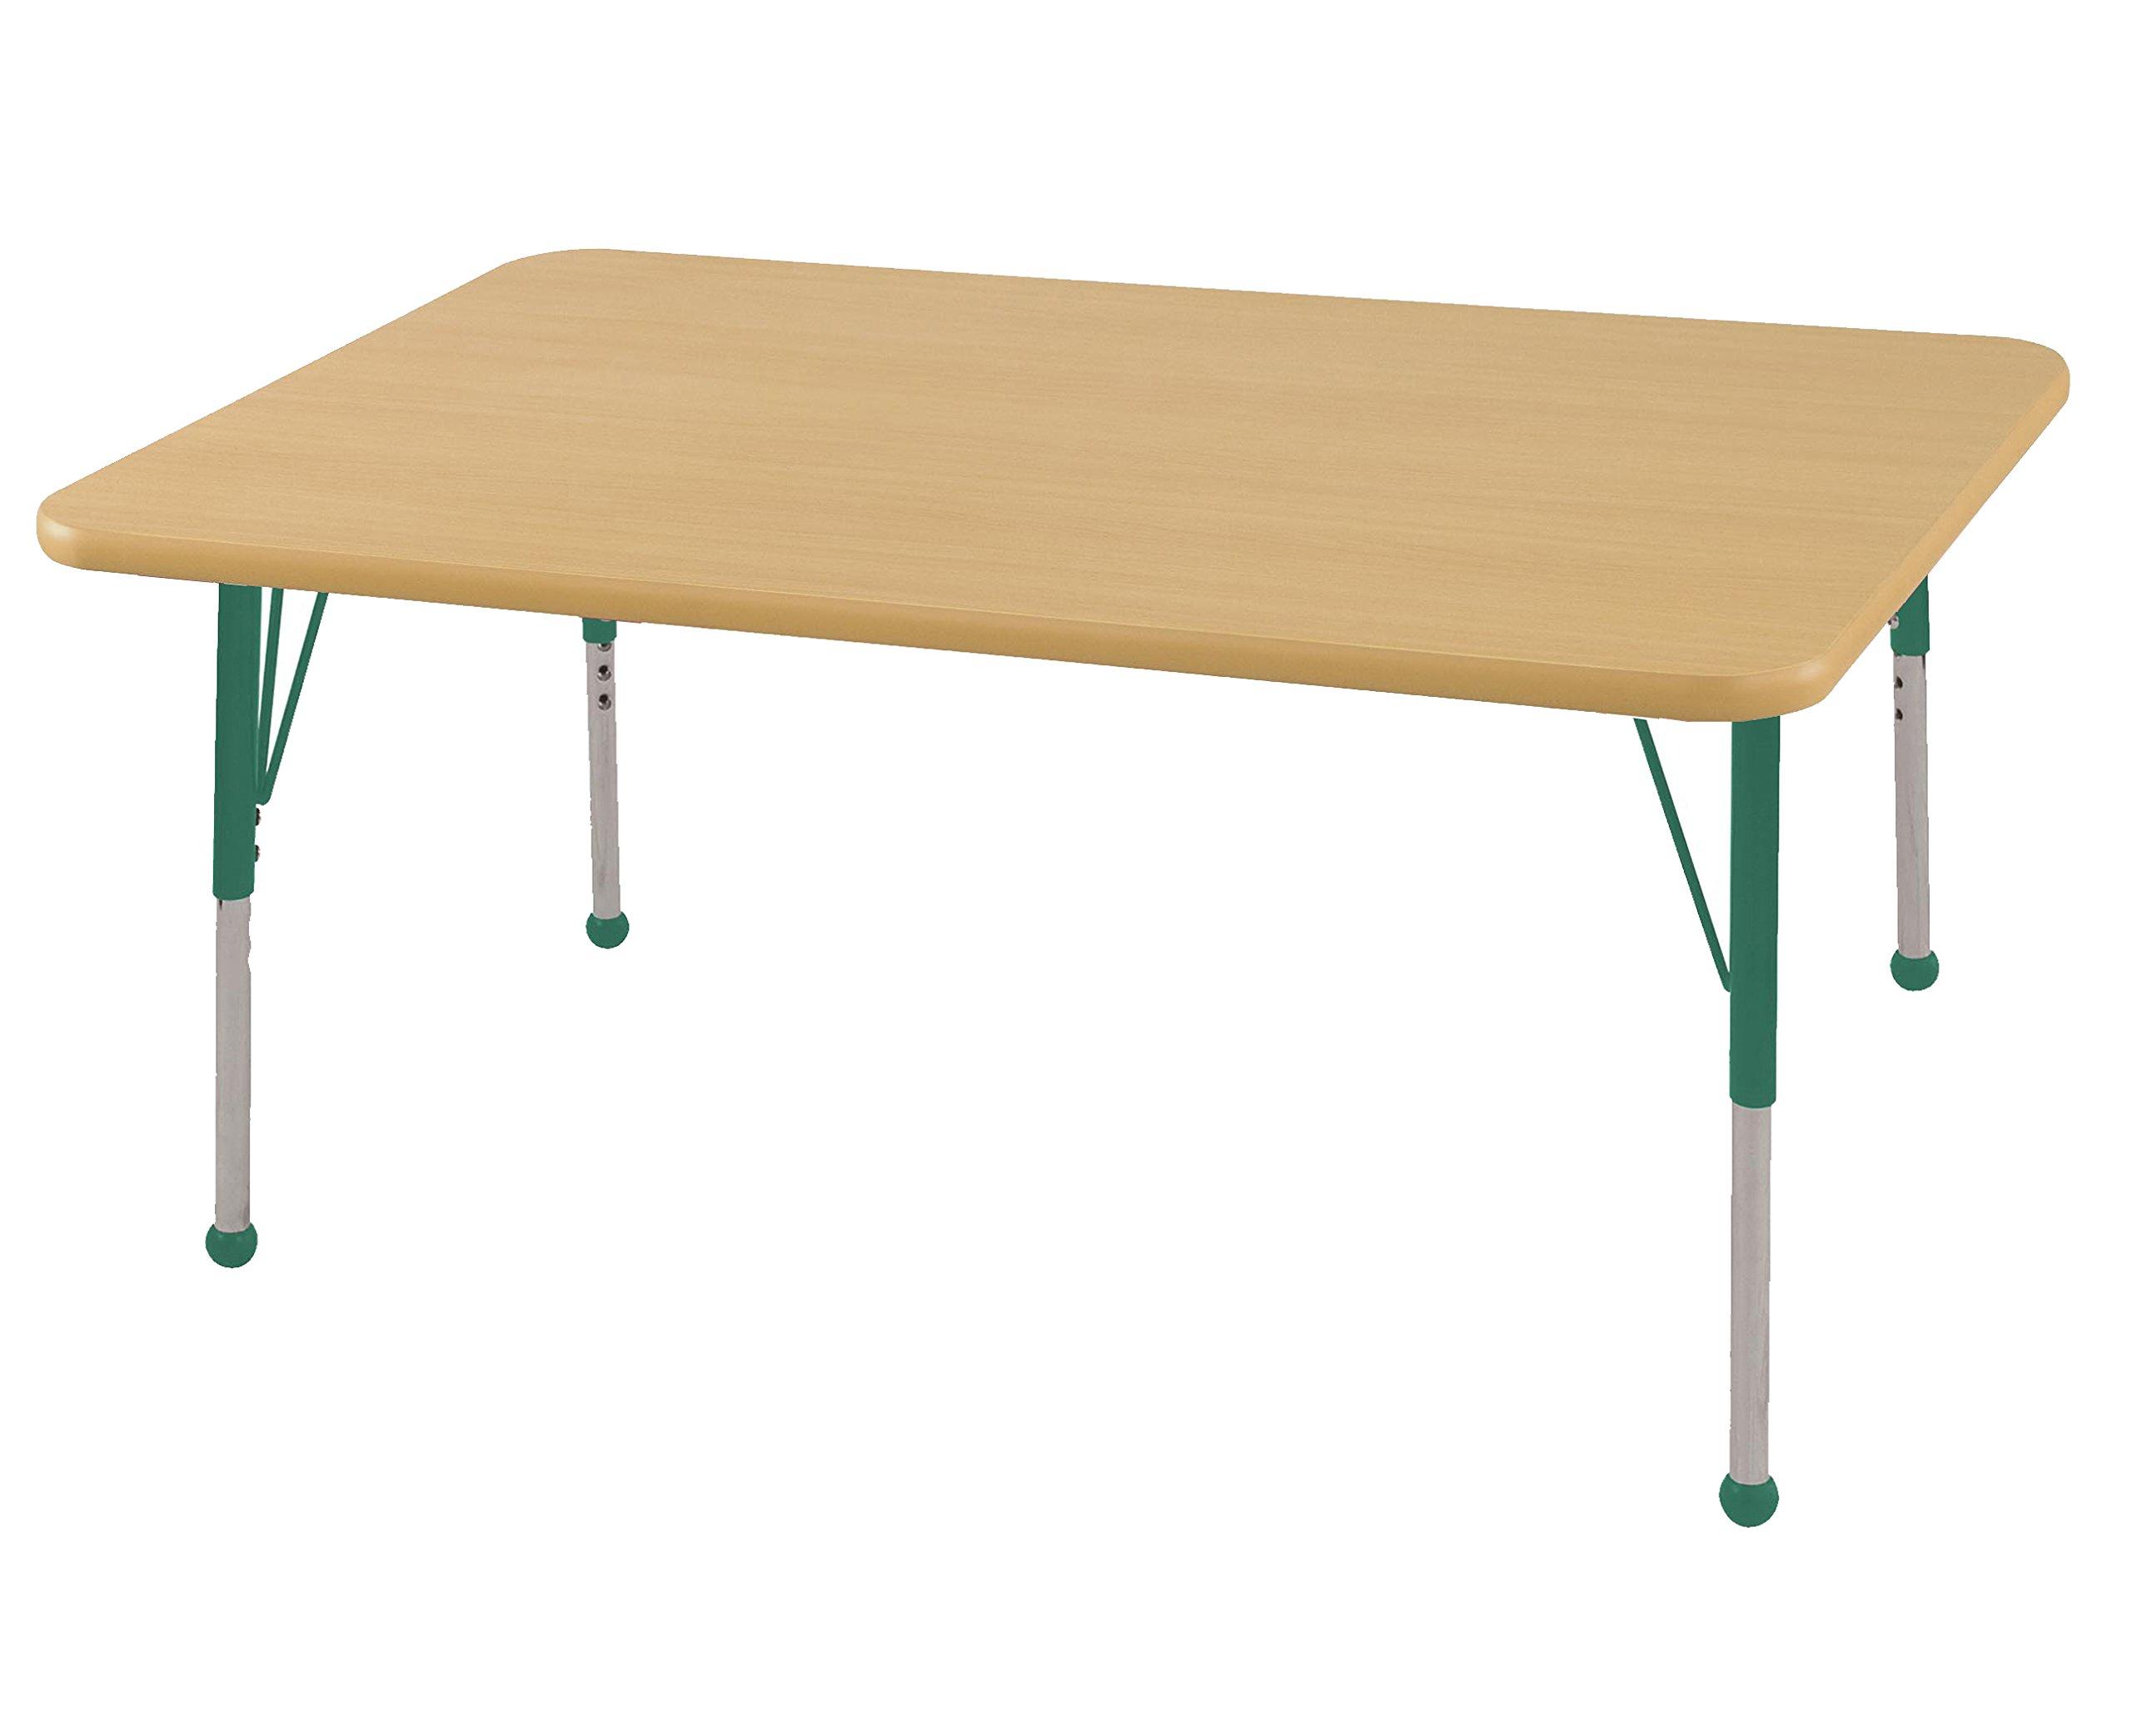 ECR4Kids Mesa T-Mold 30'' x 48'' Rectangular School Activity Table, Standard Legs w/ Ball Glides, Adjustable Height 19-30 inch (Maple/Green)